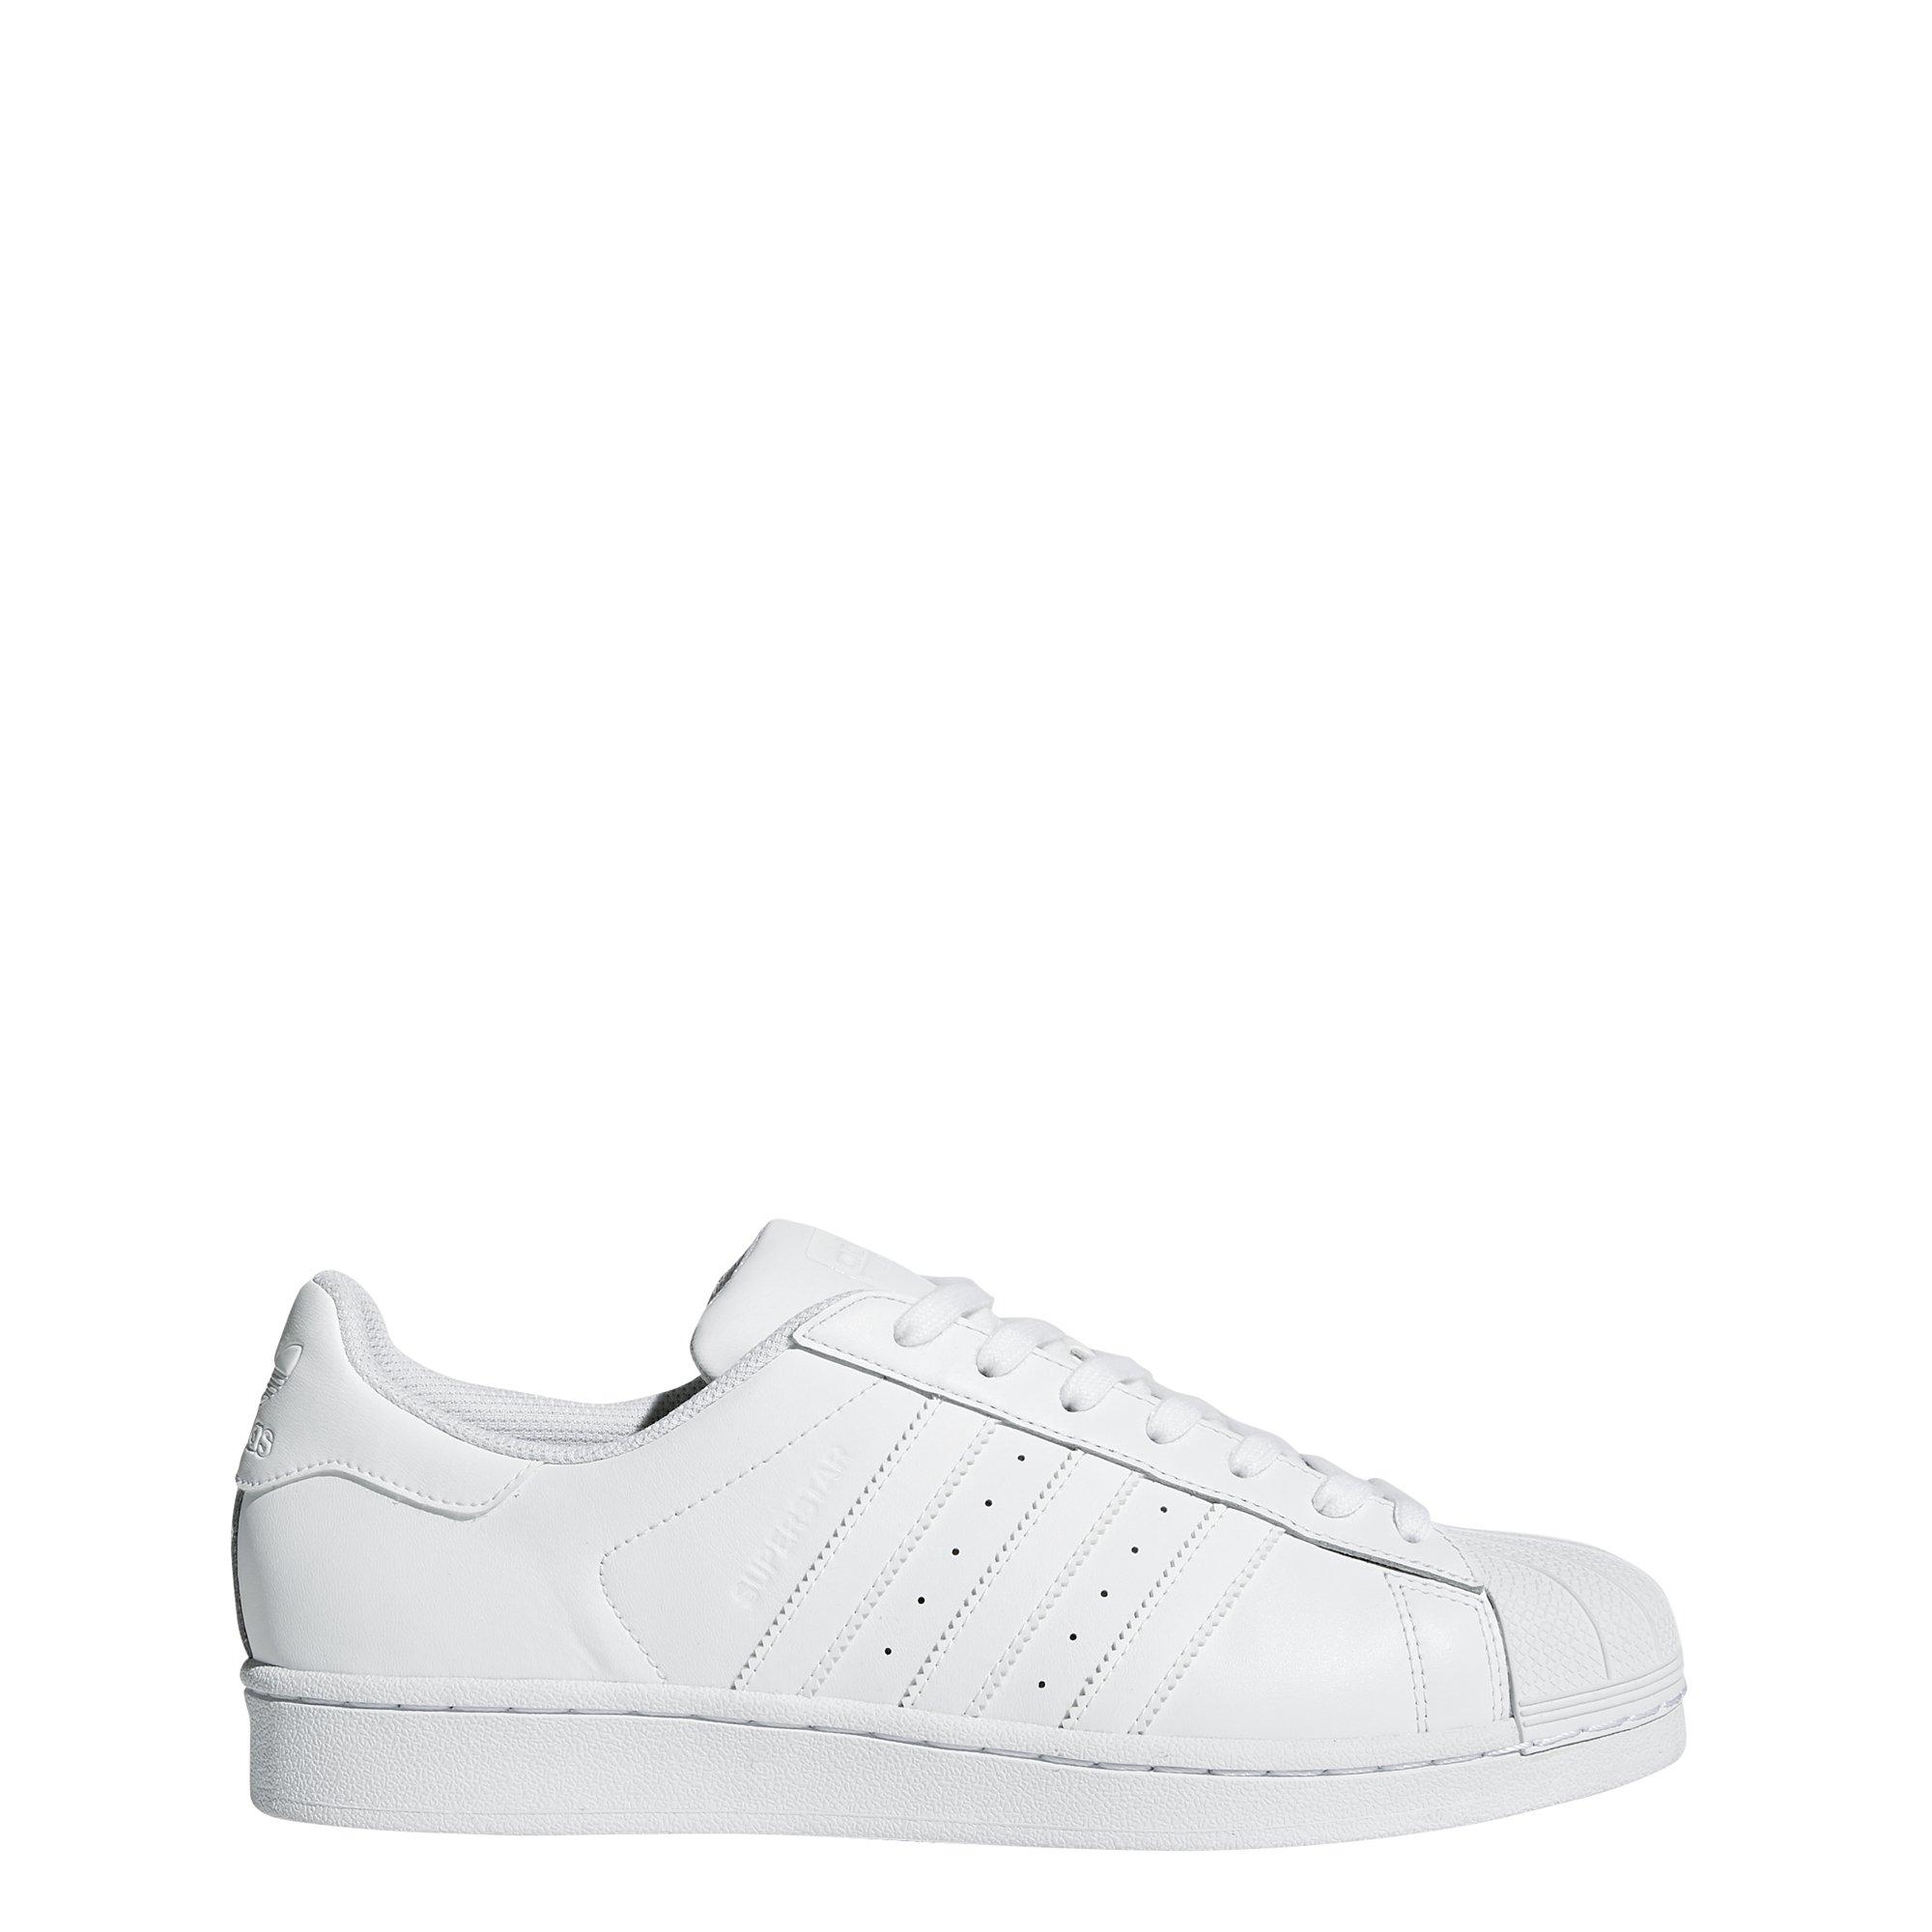 adidas Originals Men's Superstar Foundation Casual Sneaker, White/Running White/White, 15 D(M) US by adidas Originals